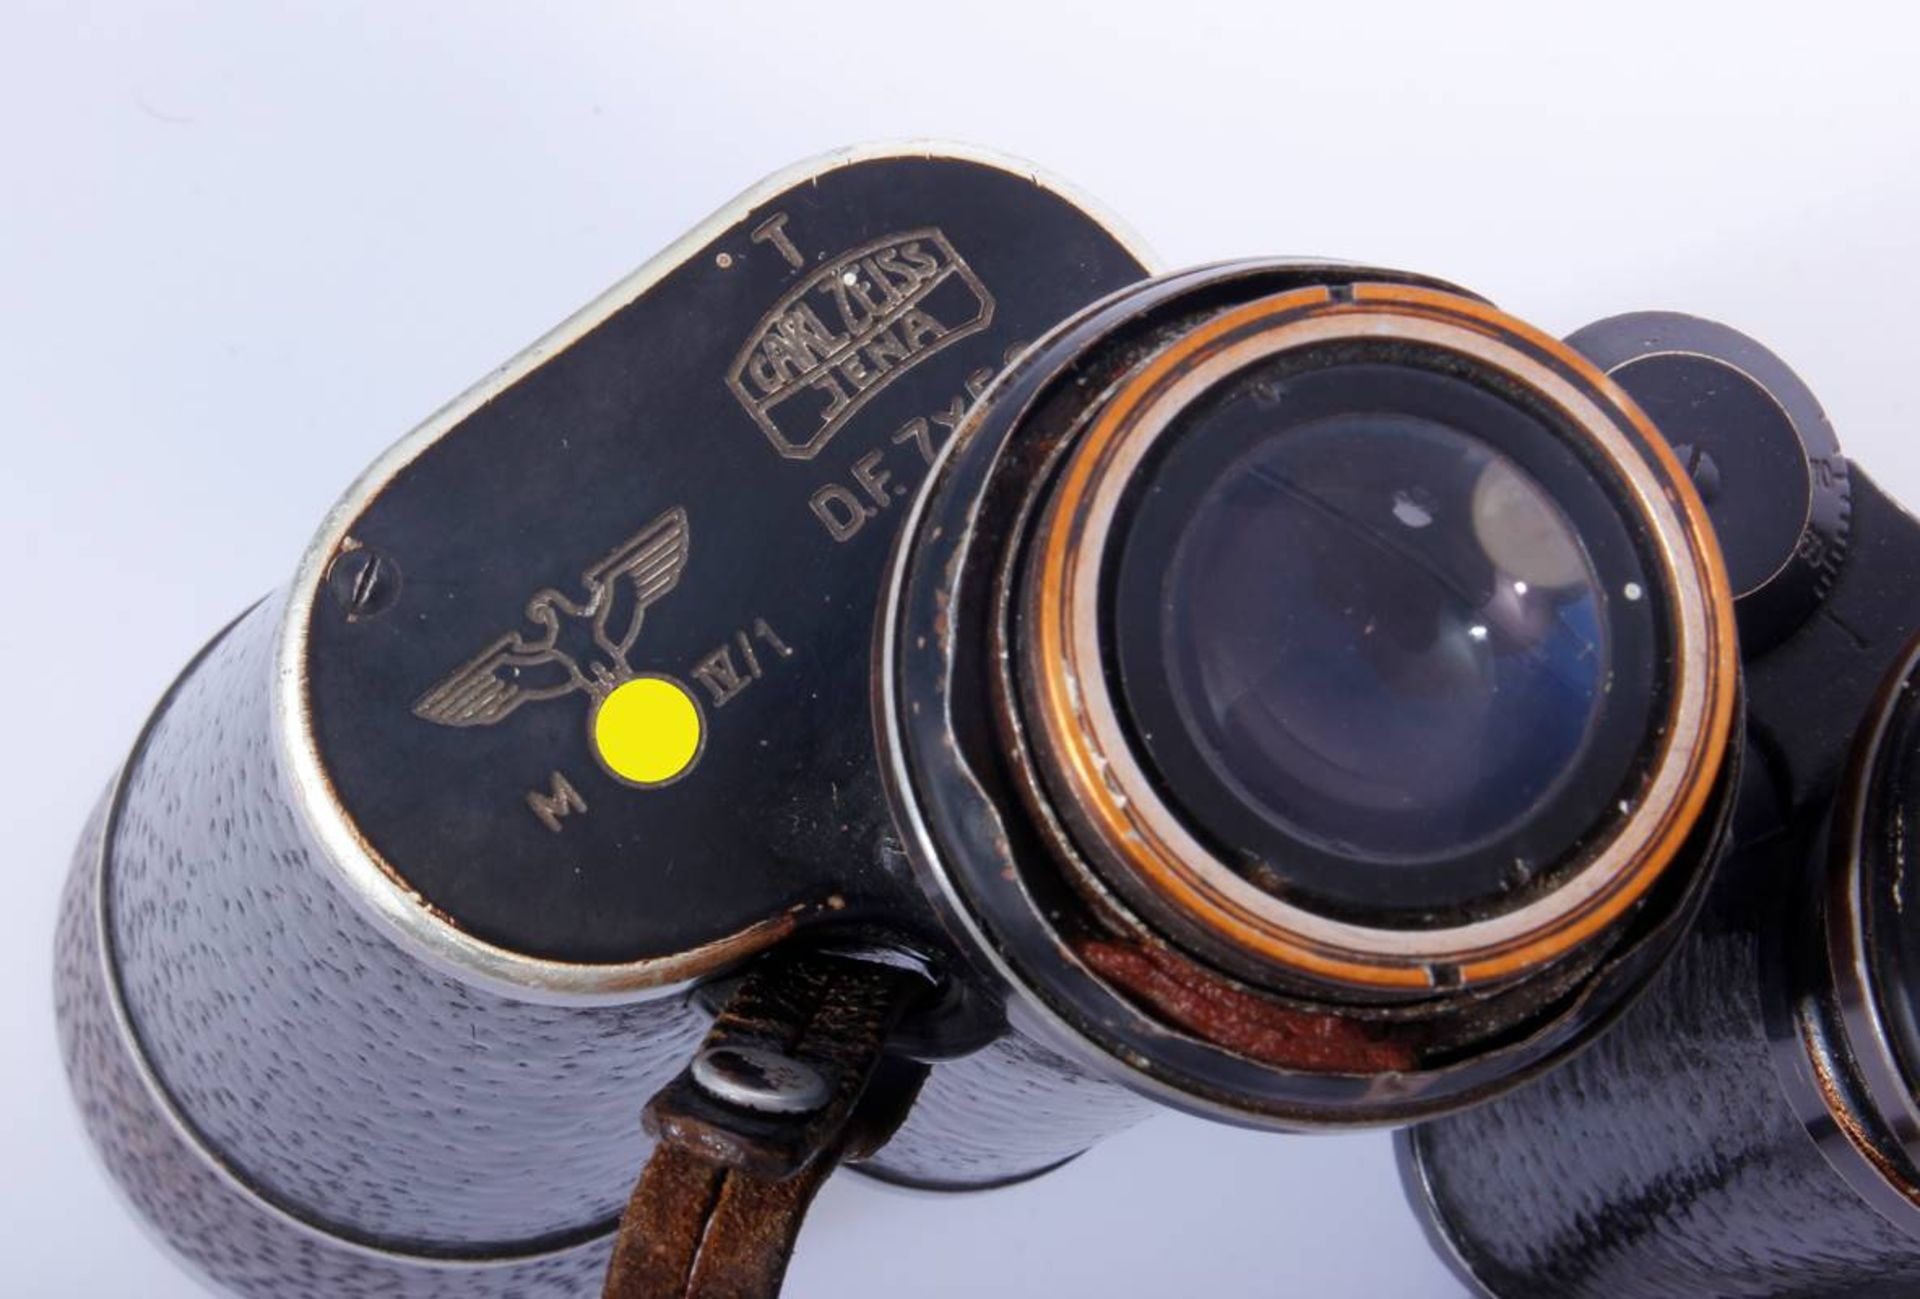 Marinefernglas DE 7 x 50Schwarzes Marinefernglas 7 x 50 DE Karl Zeiss Jena mit Abnahmestempel, - Bild 7 aus 7